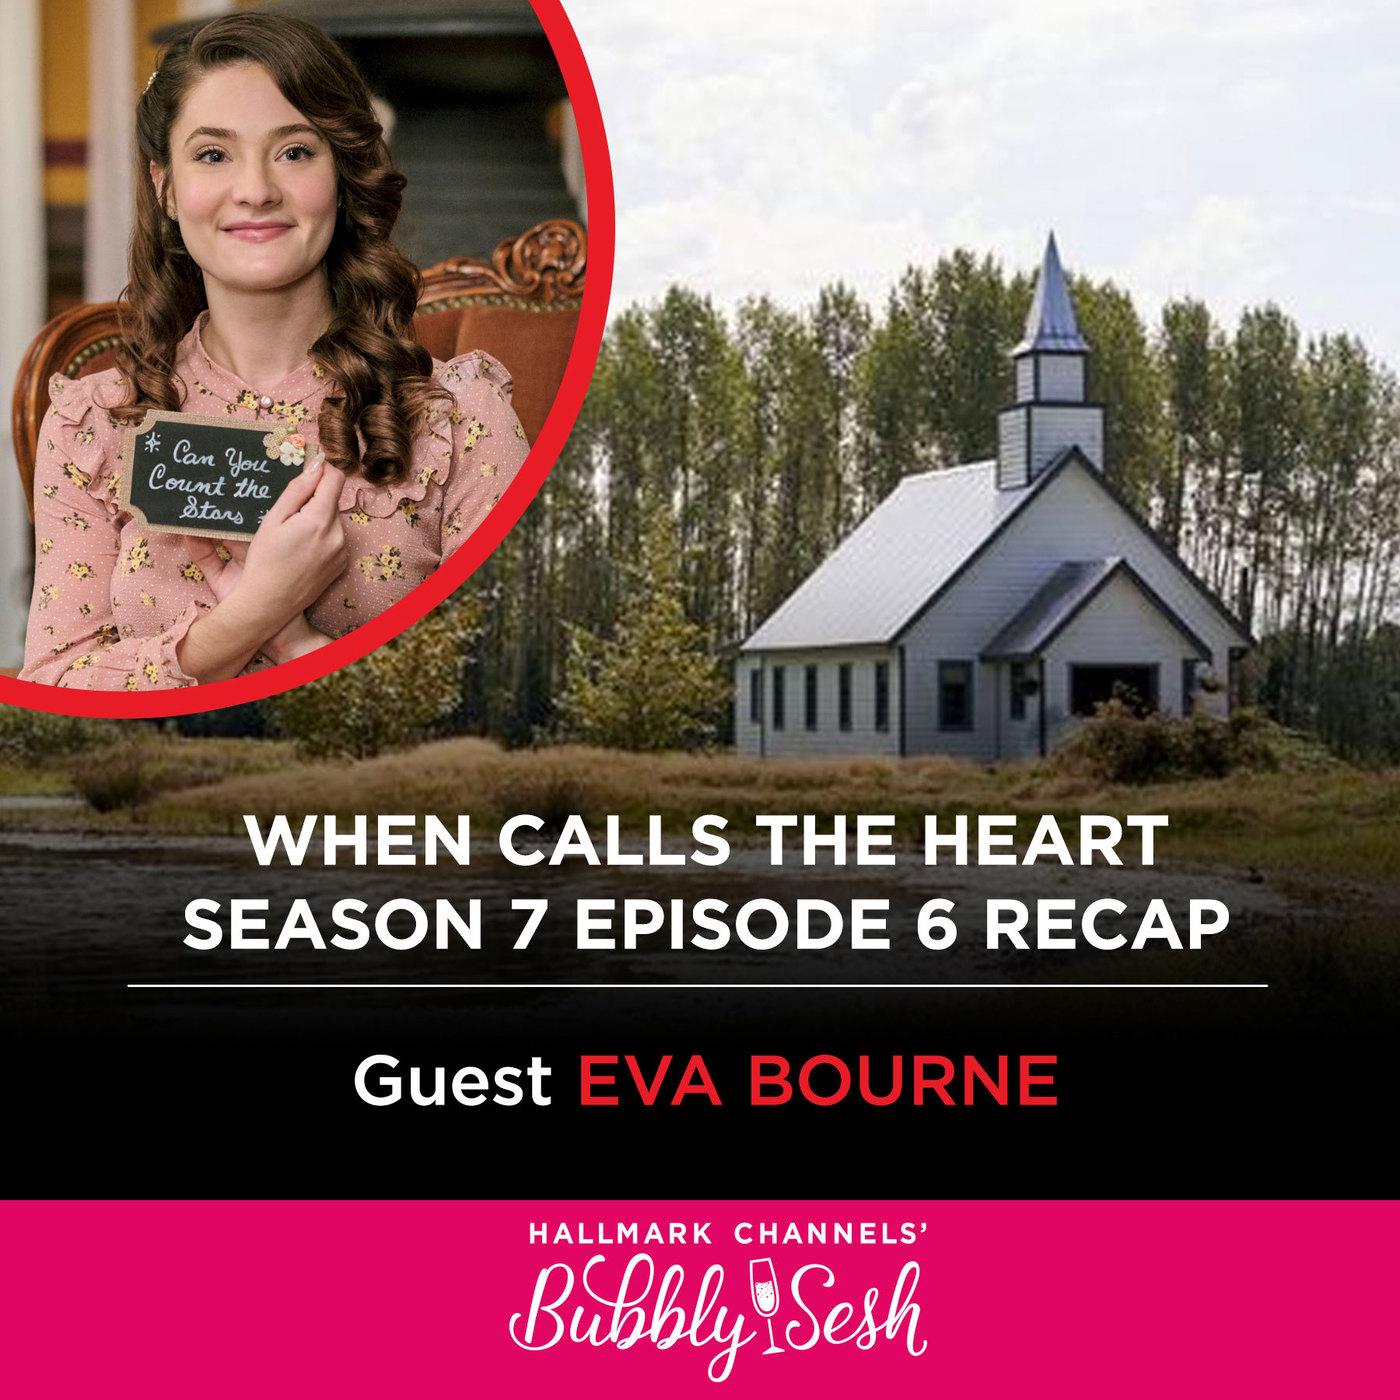 When Calls The Heart Season 7, Episode 6 Recap with Guest Eva Bourne